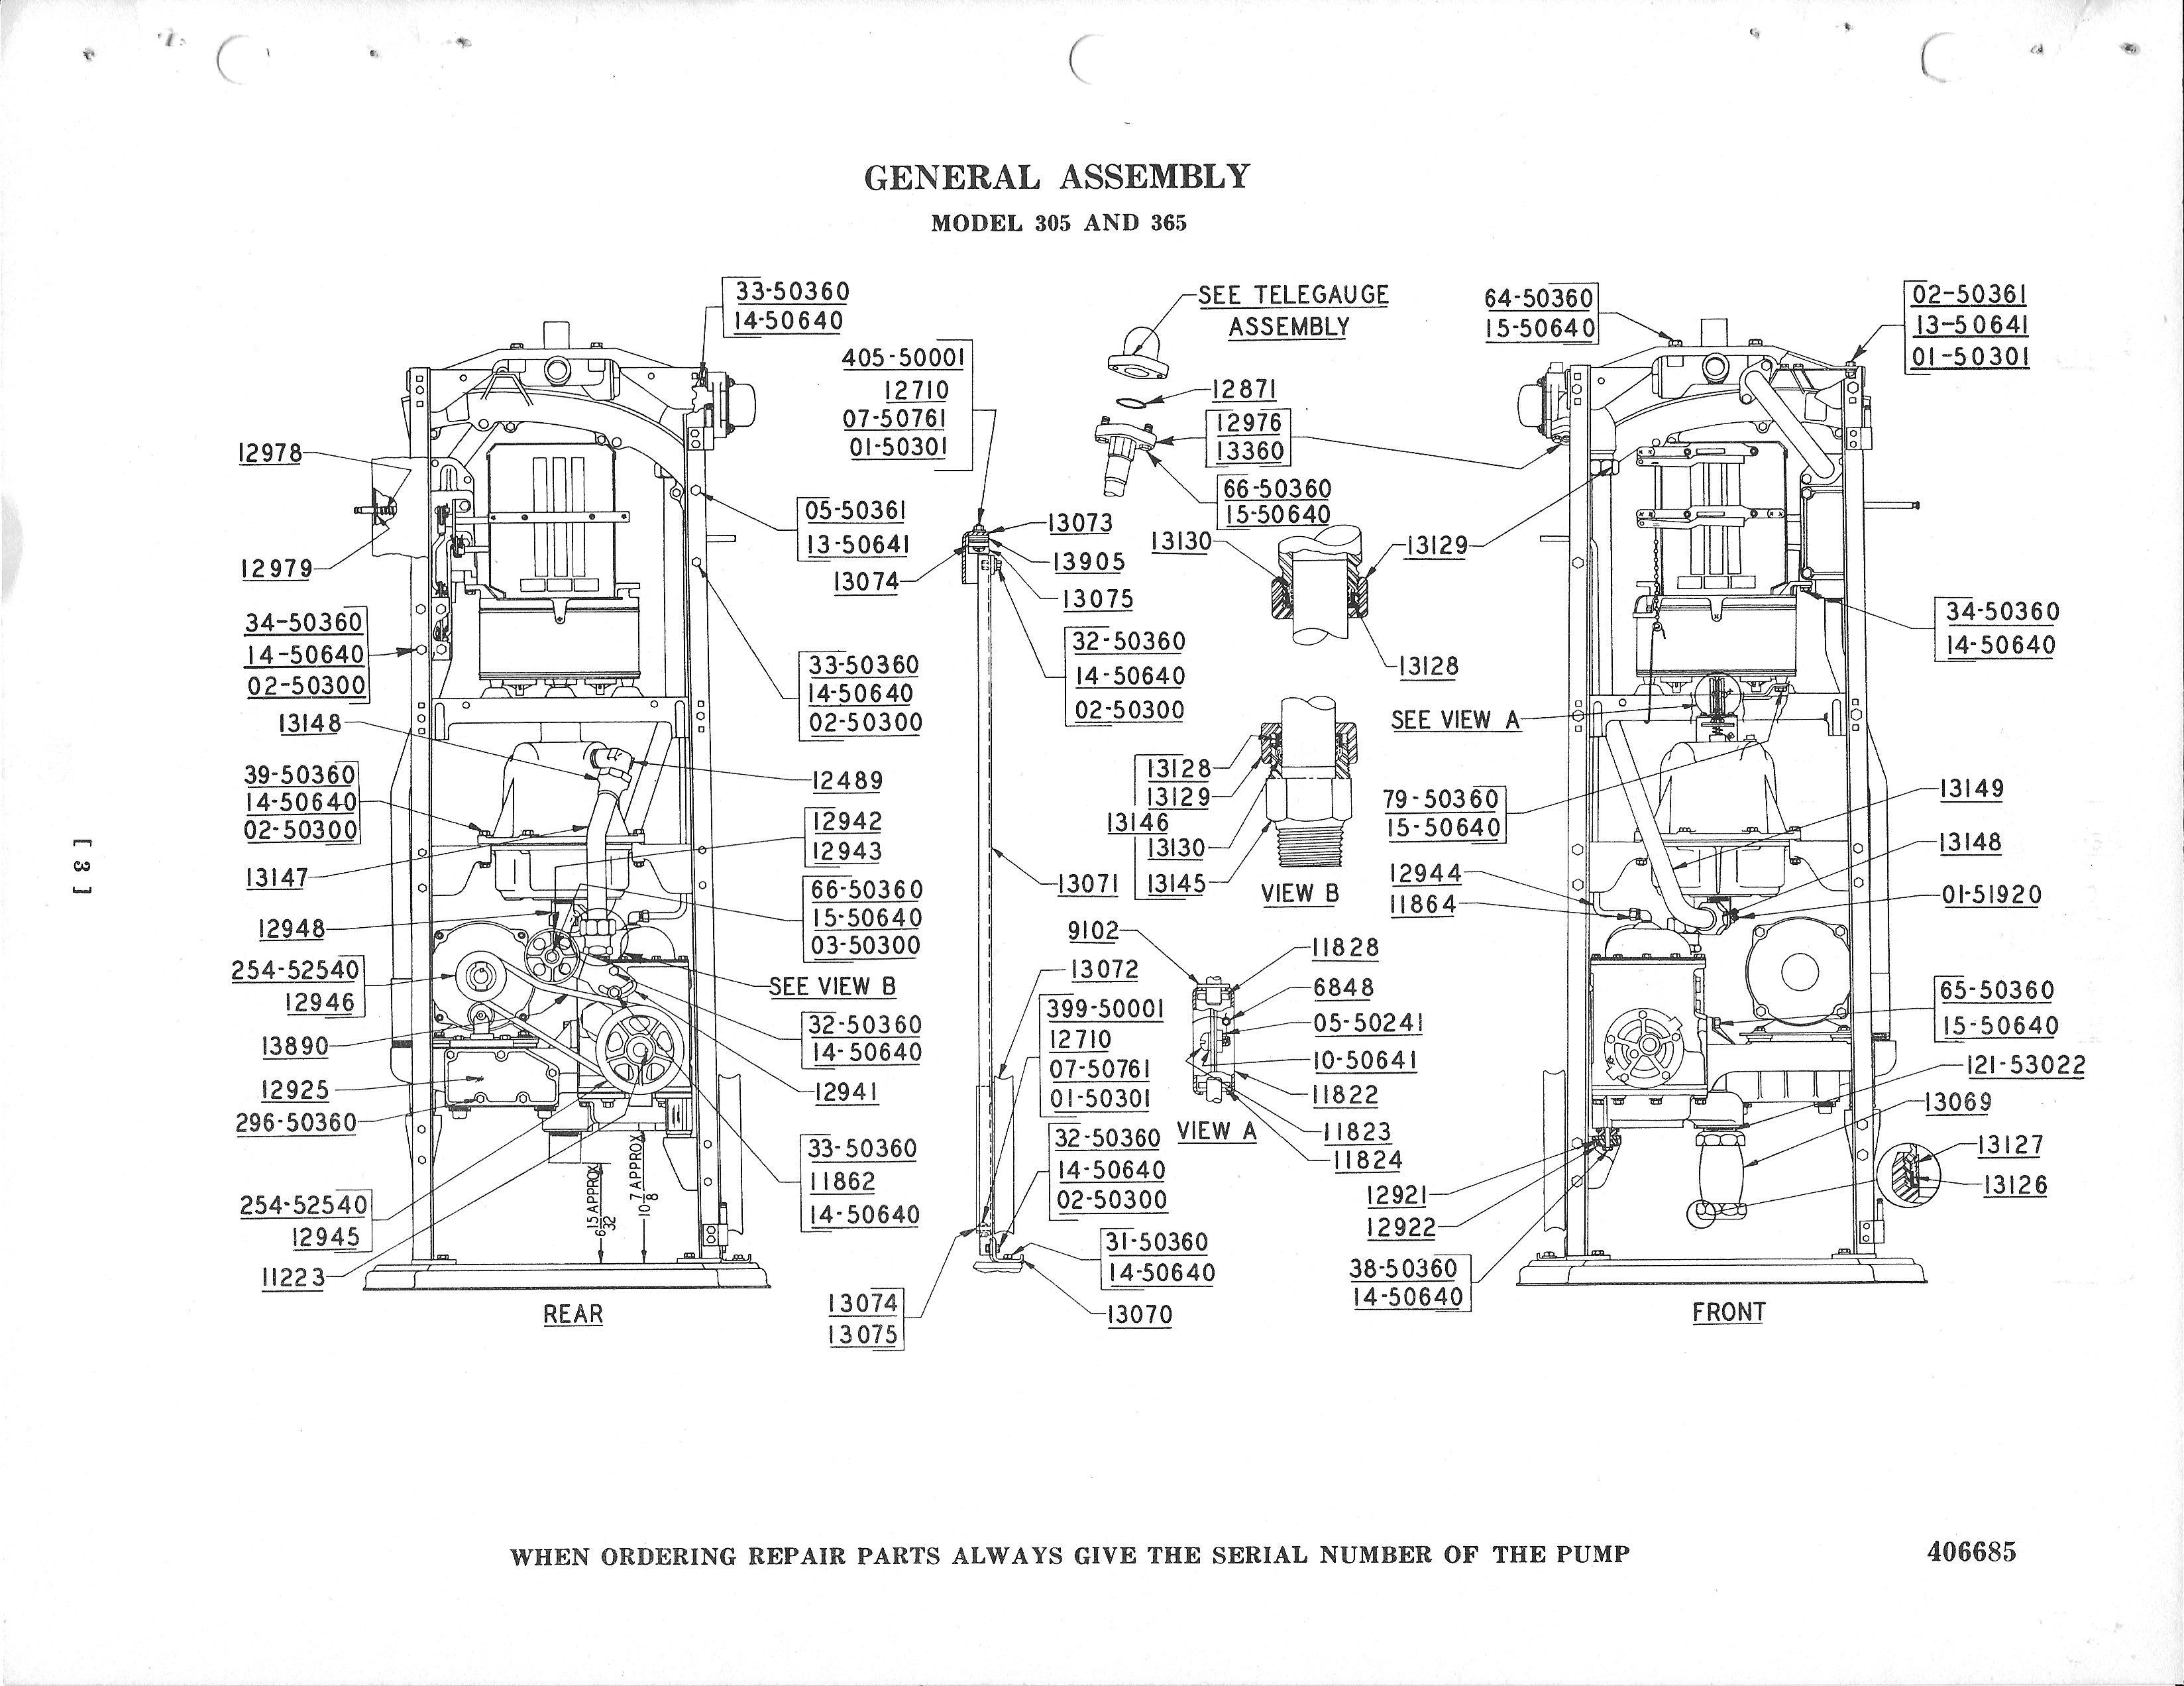 stearns brake wiring diagram fog lights sb industrial supply mro plc equipment parts